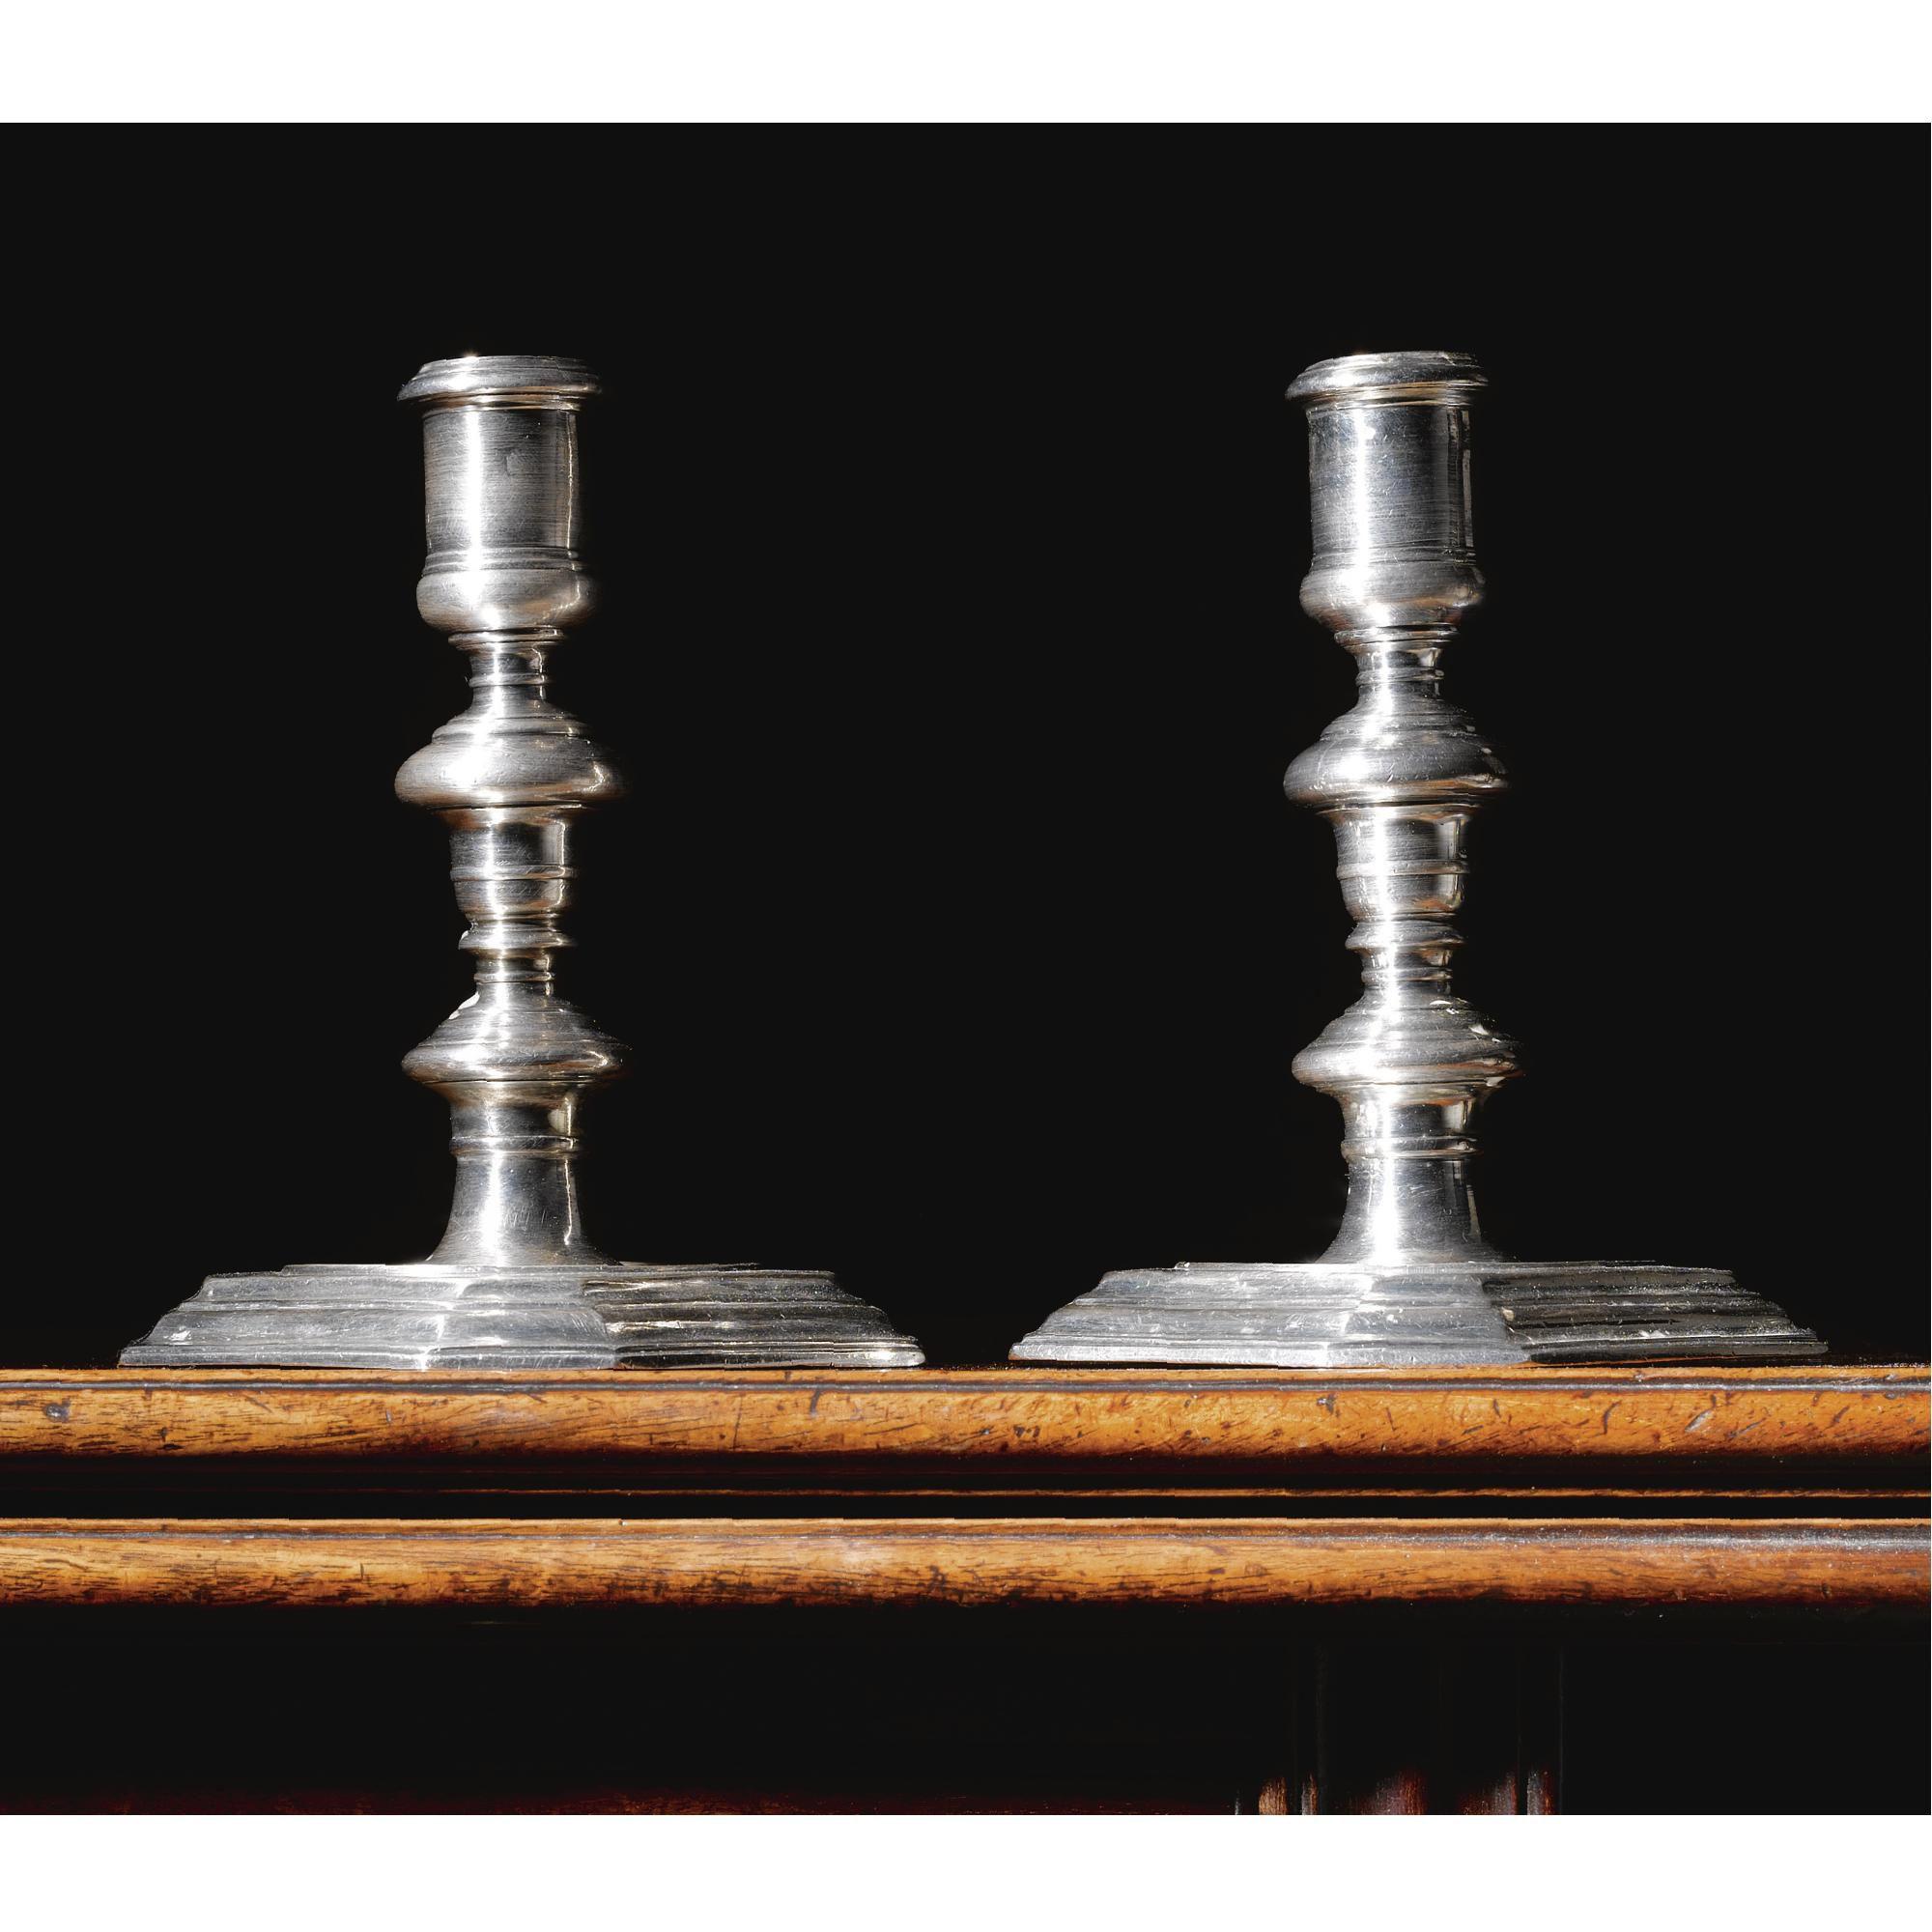 A fine pair of William III Britannia standard silver candlesticks, Pierre Harache I, A French Huguenot refugee  London, 1698